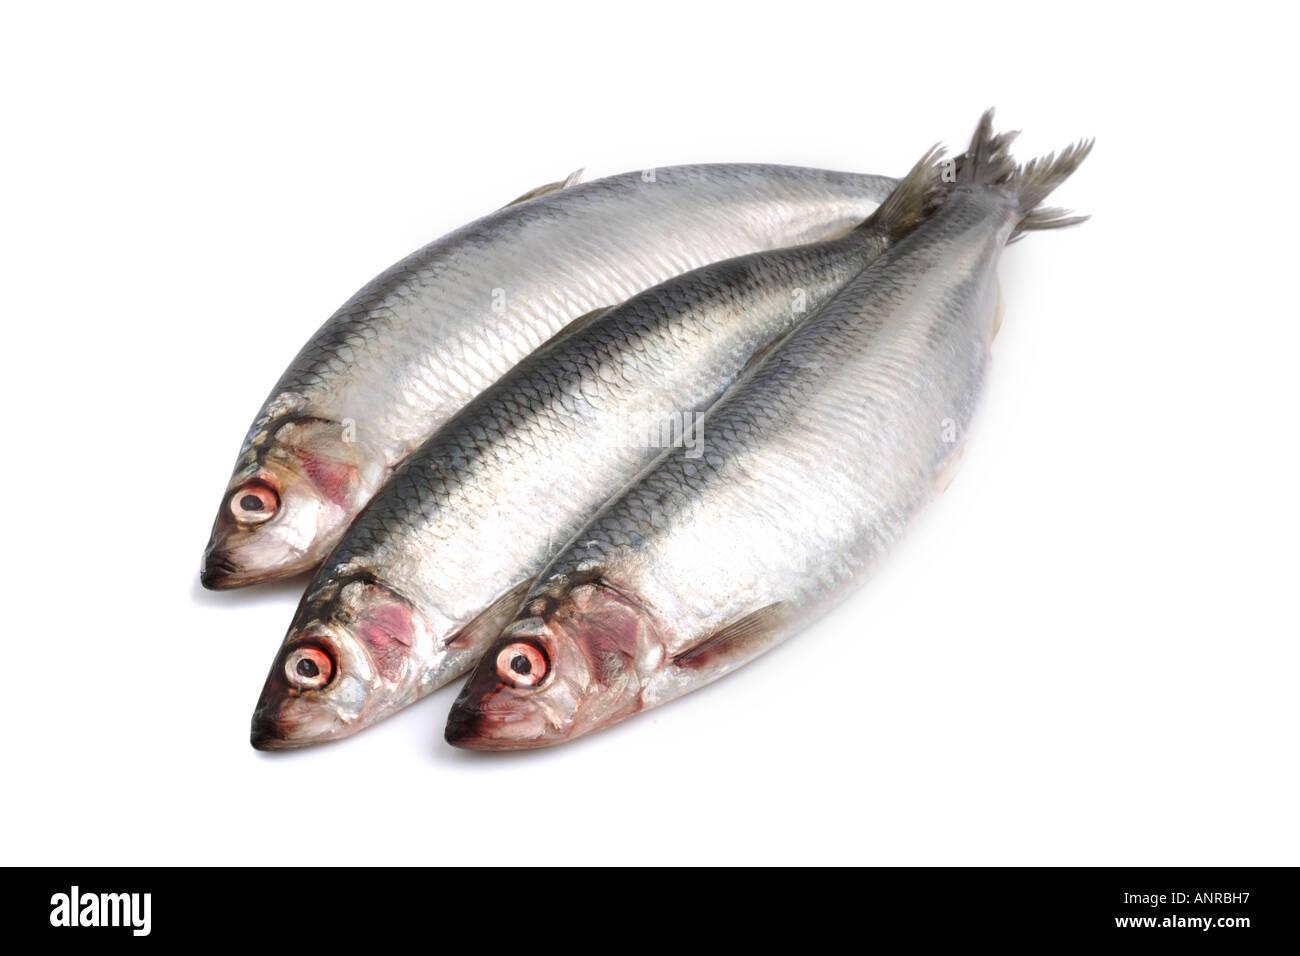 herrings-an-oily-fish-on-white-backgroun